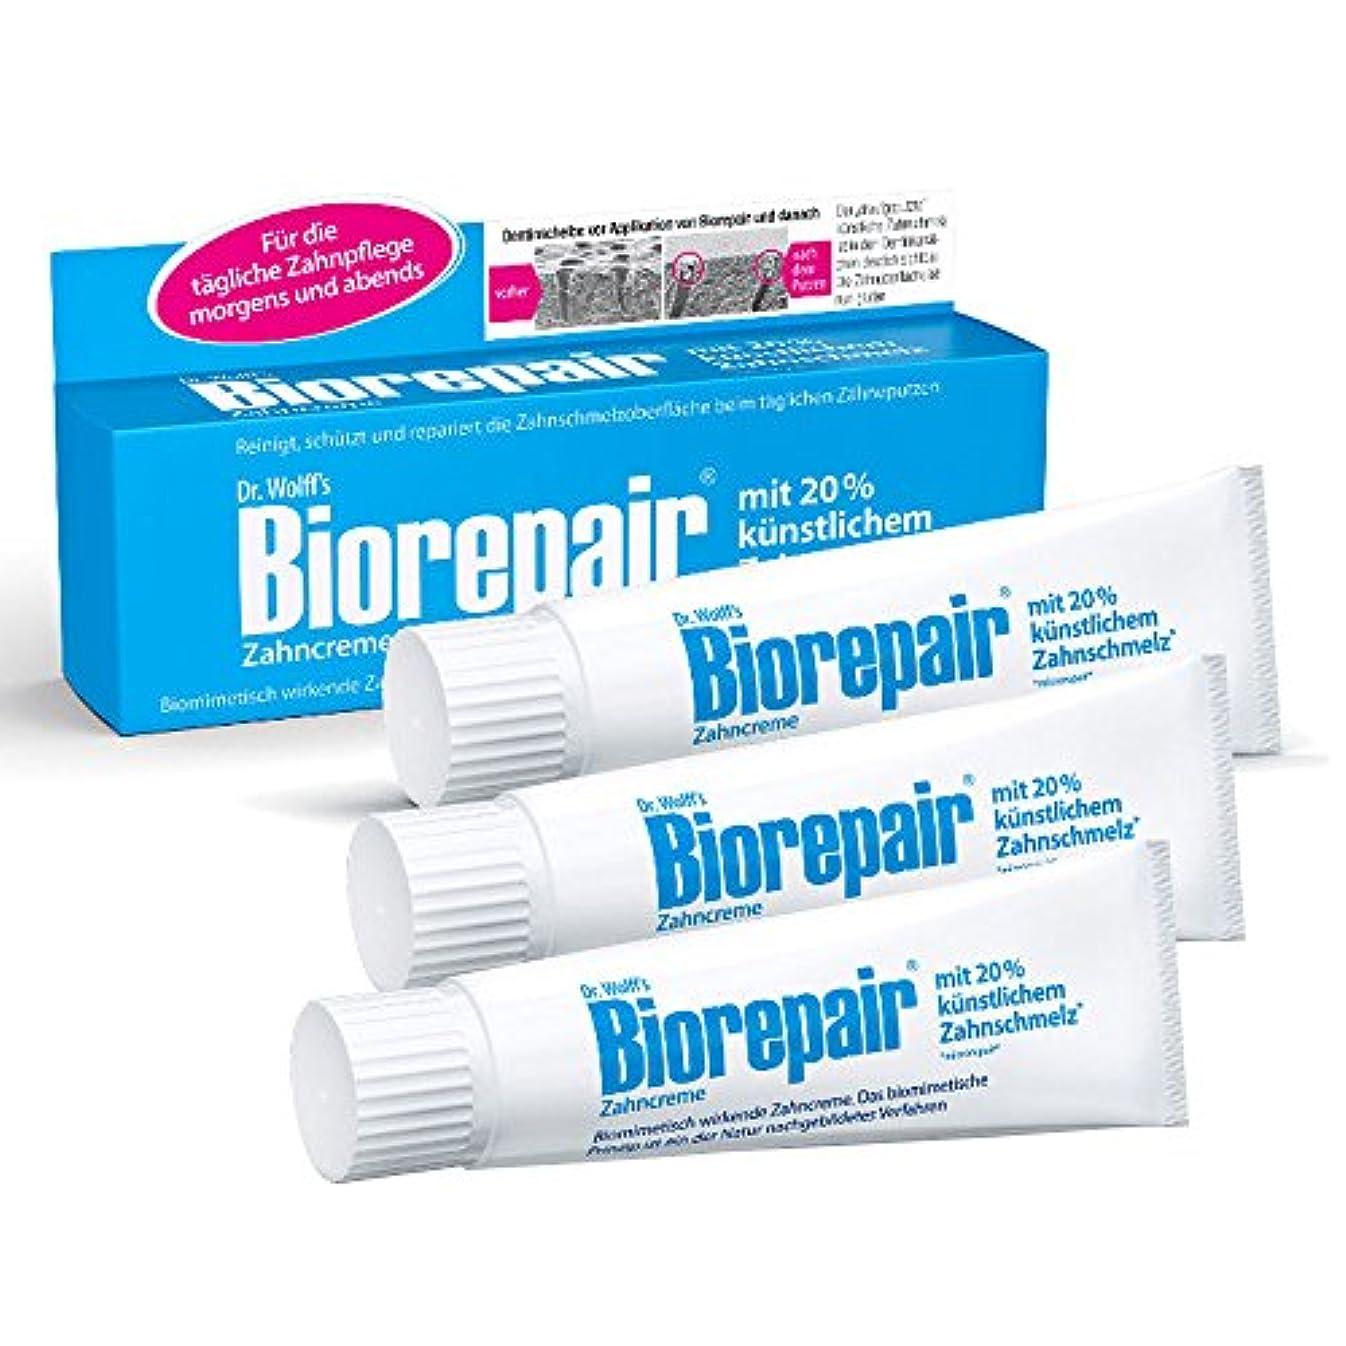 Biorepair 歯磨き粉オリジナル、75ml 歯の保護 耐摩耗性 x 3 [並行輸入品]